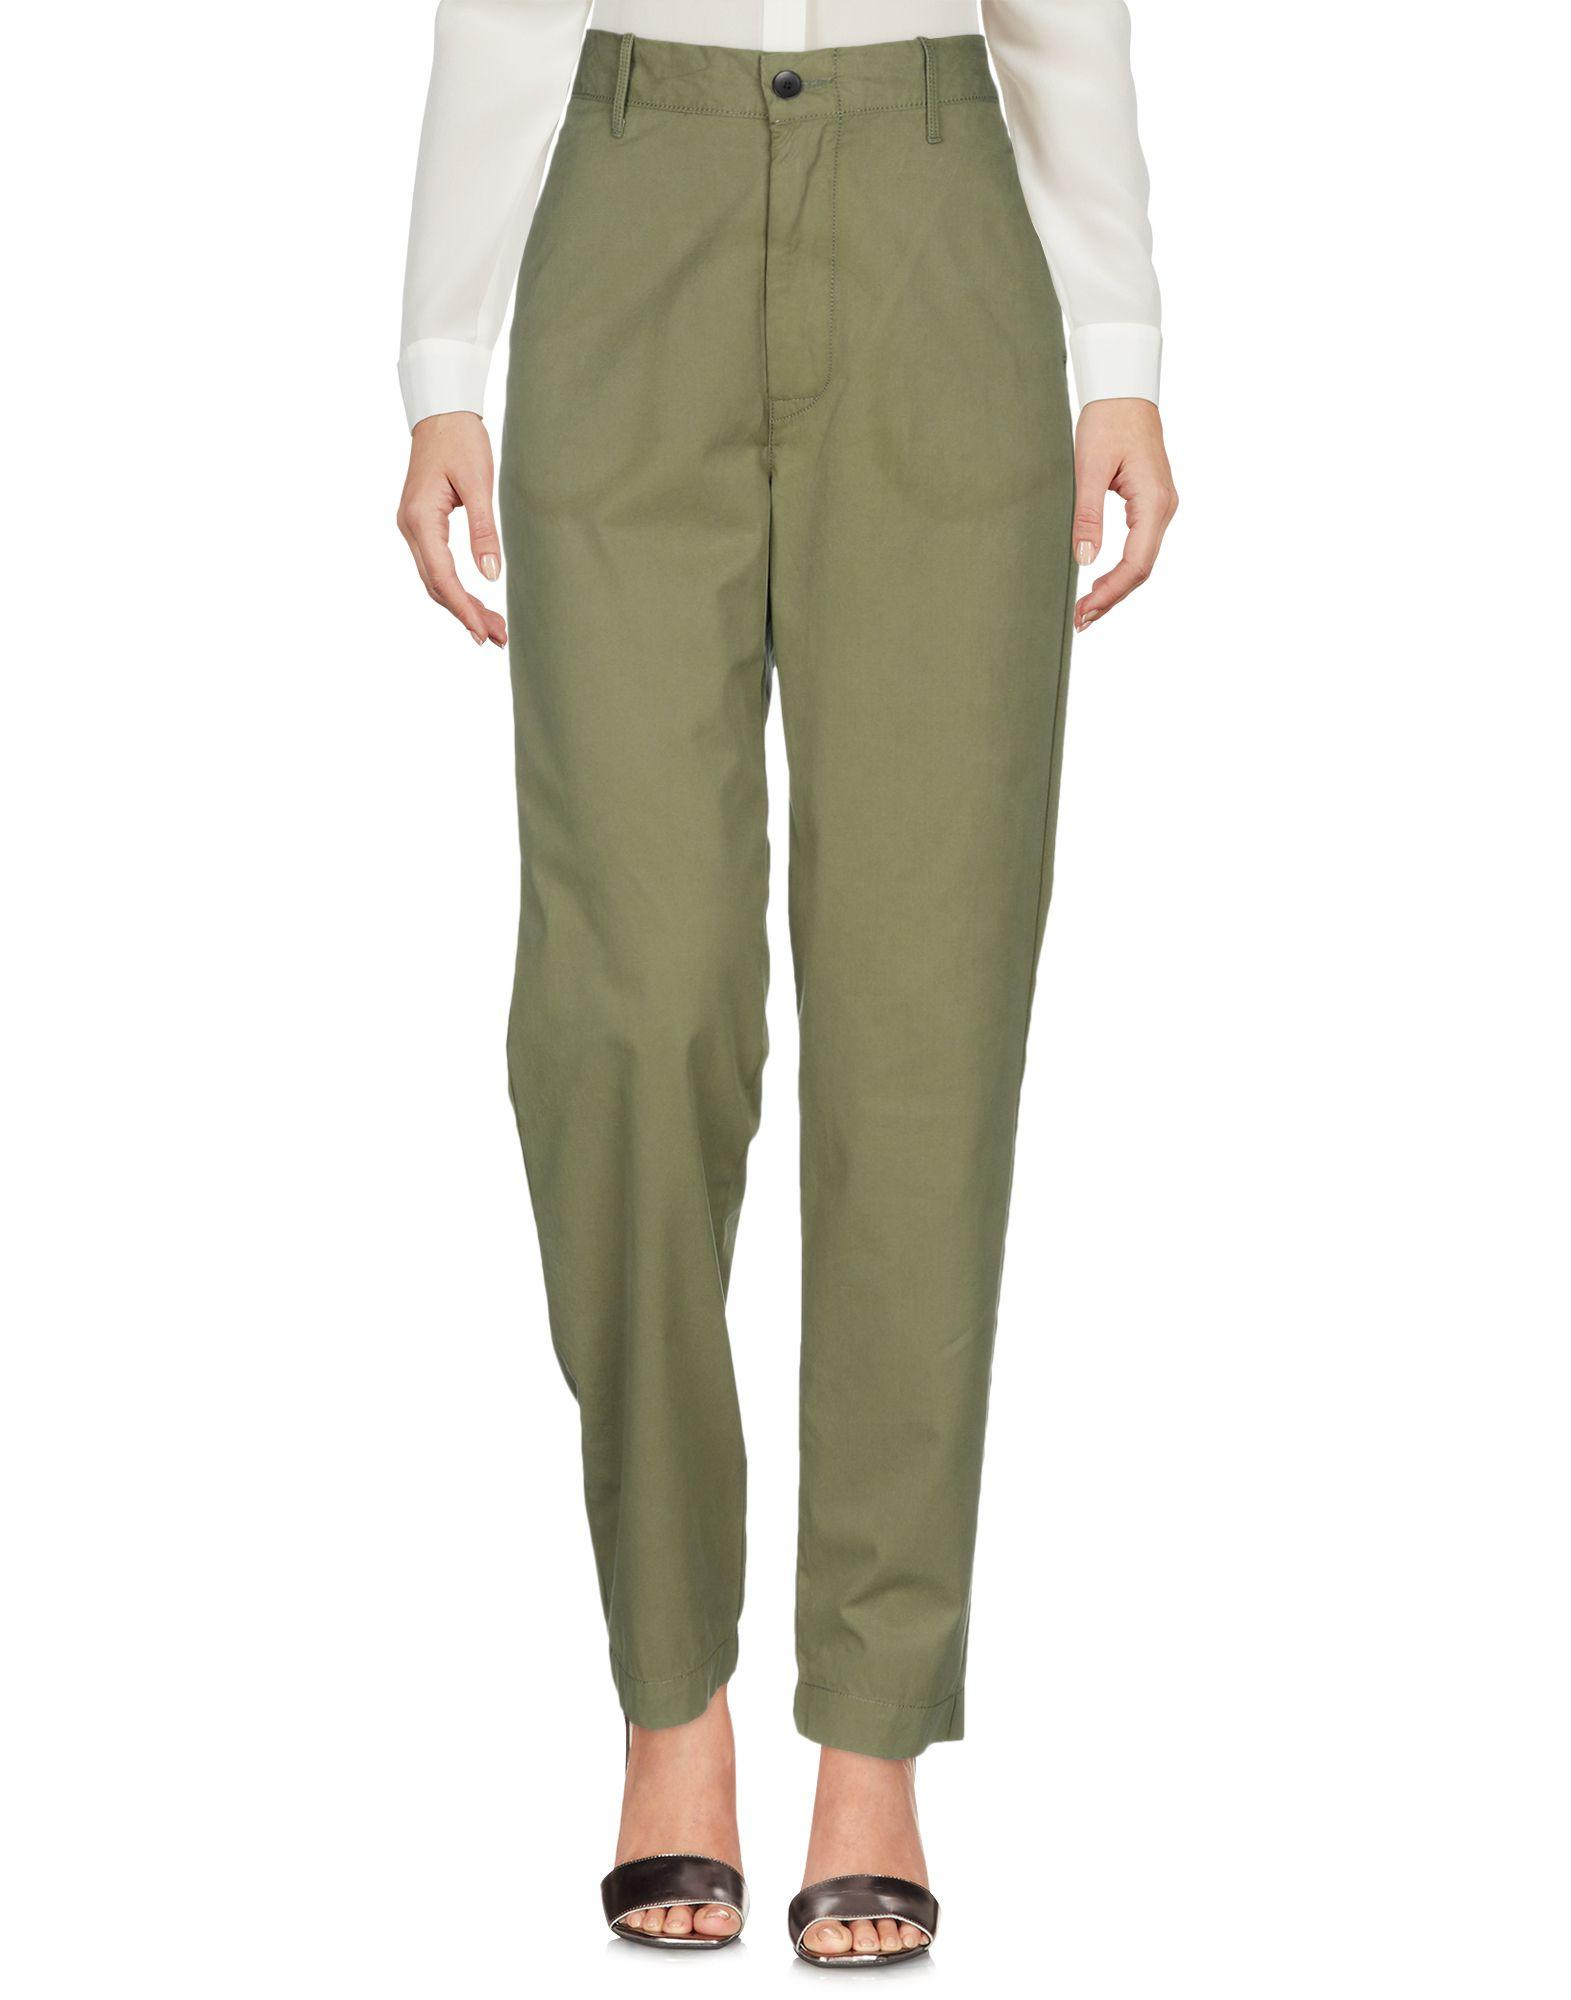 Pantalones Bellerose de Denim de color Verde